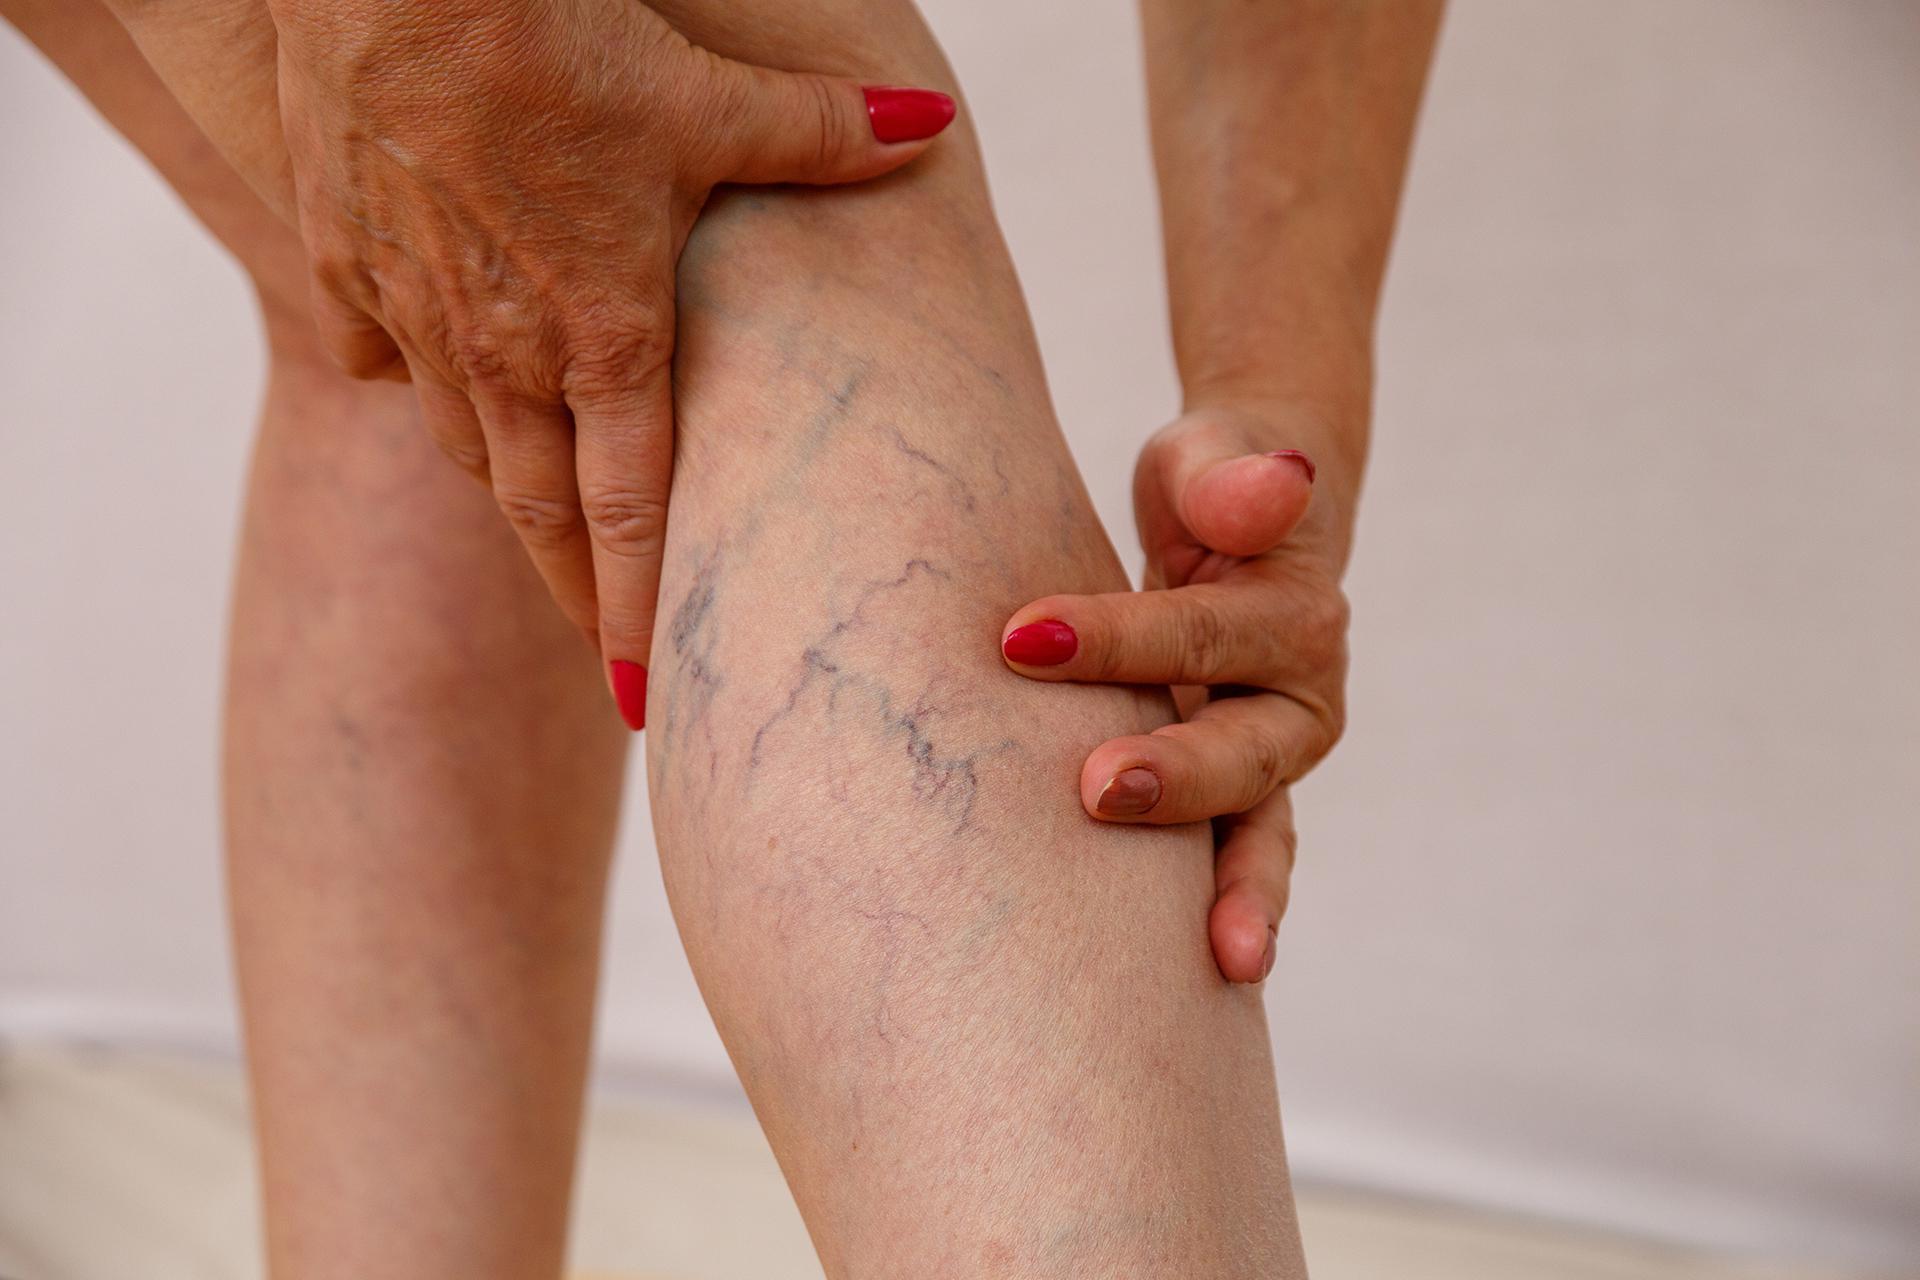 vascular-issues-requiring-leg-pain-doctor-Maywood